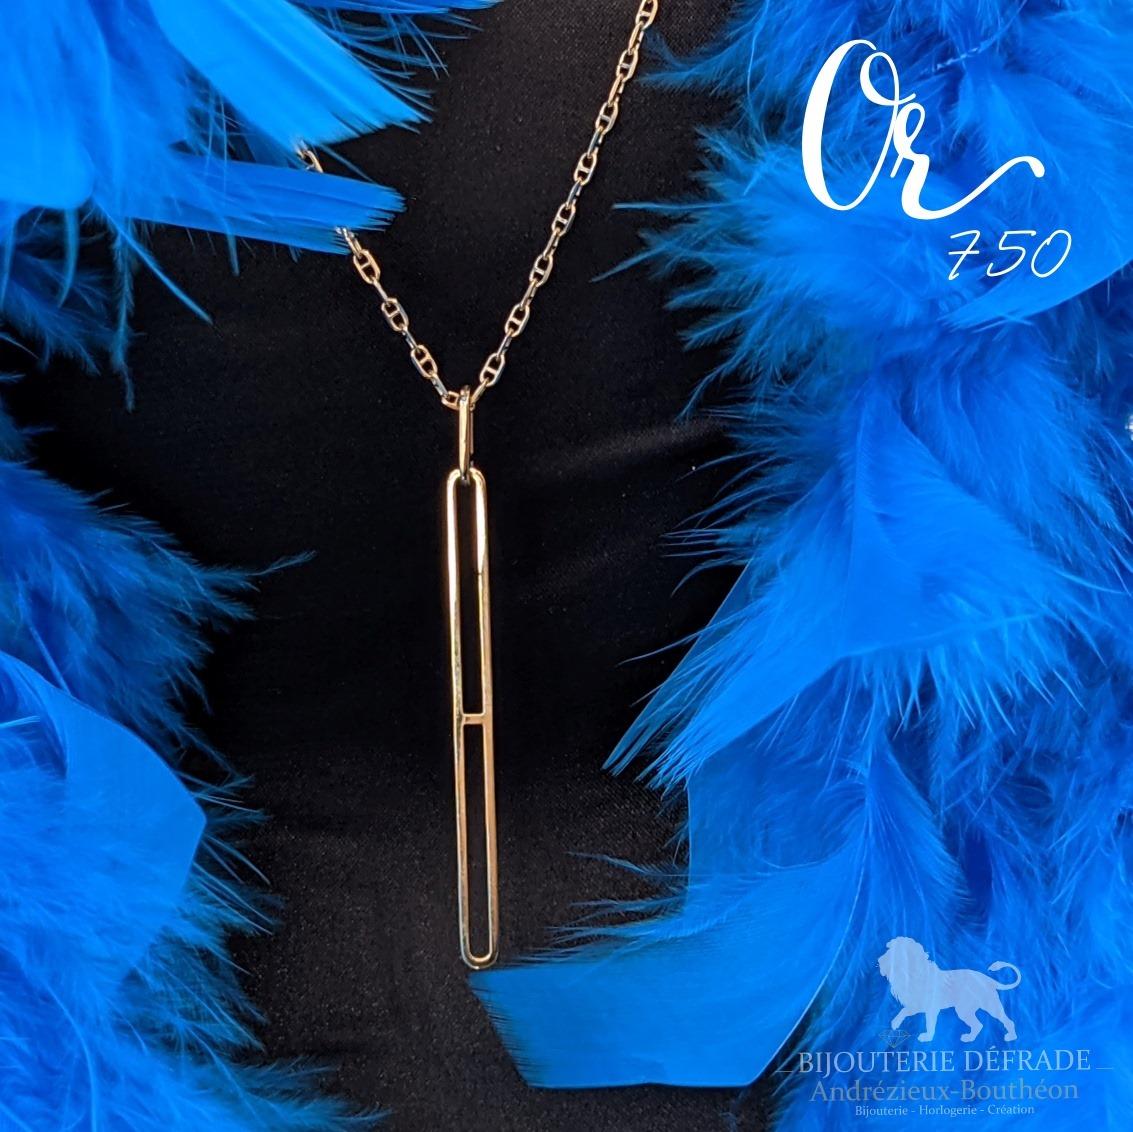 pendentif or et sautoir maille marine a la bijouterie defrade